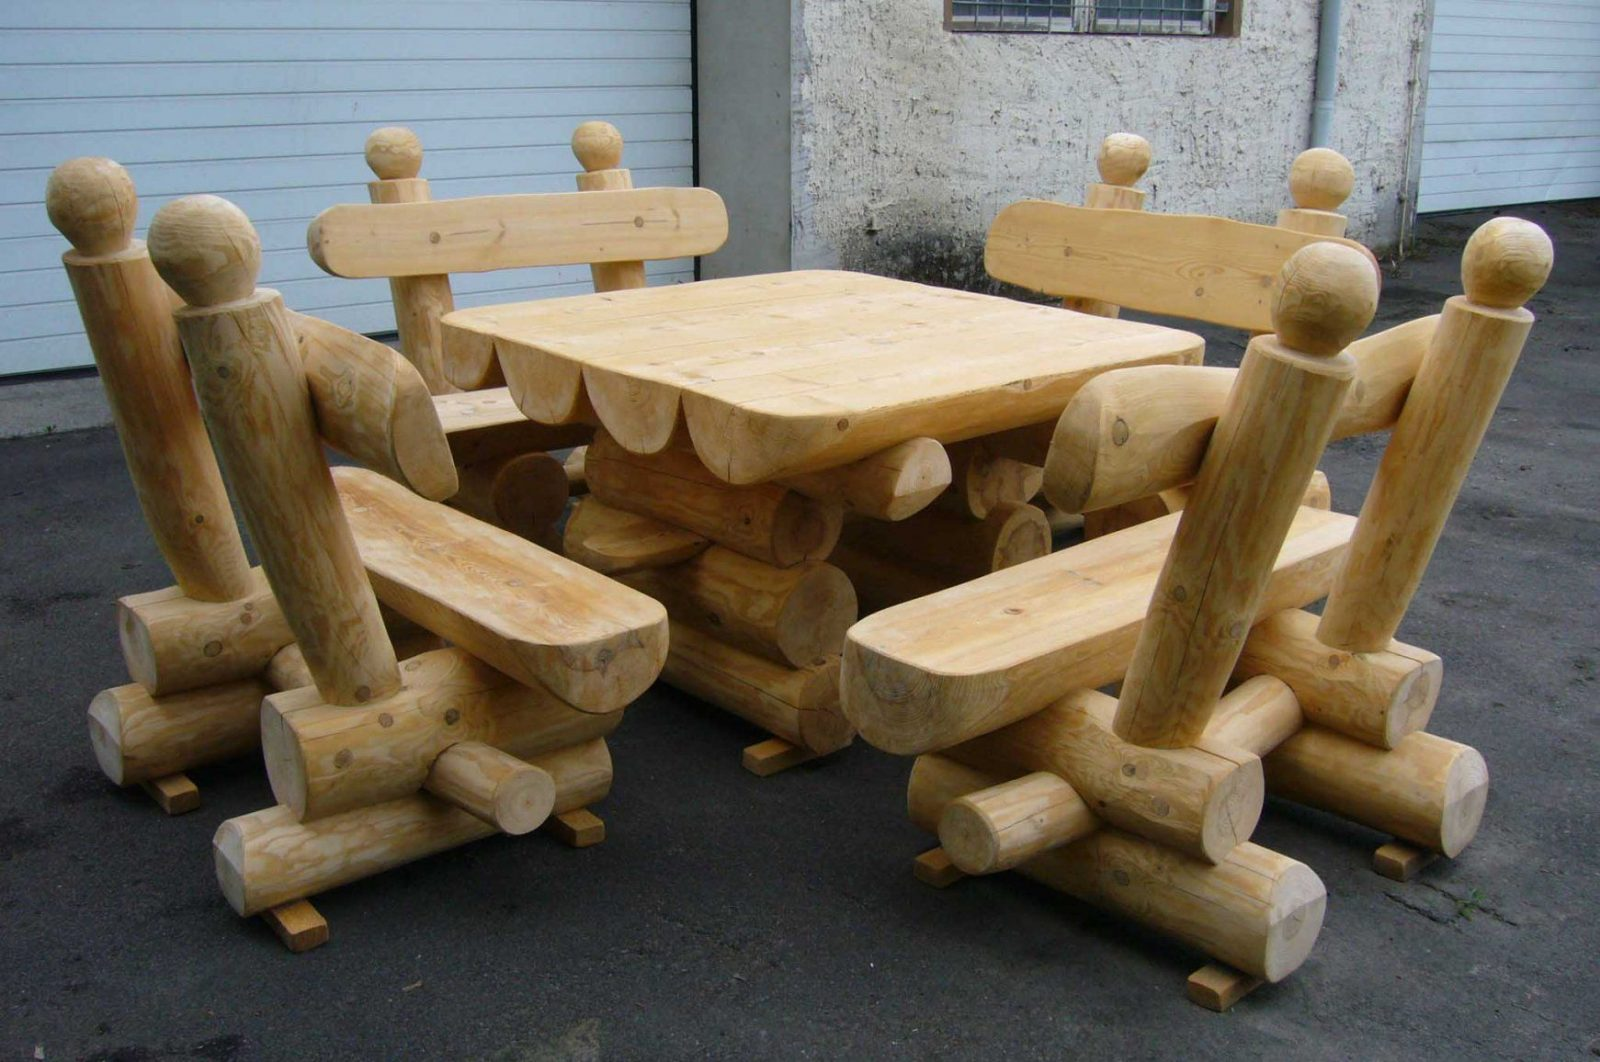 Rustikale Holzbanke Aus Polen – Siddhimind von Rustikale Holz Gartenmöbel Aus Polen Photo